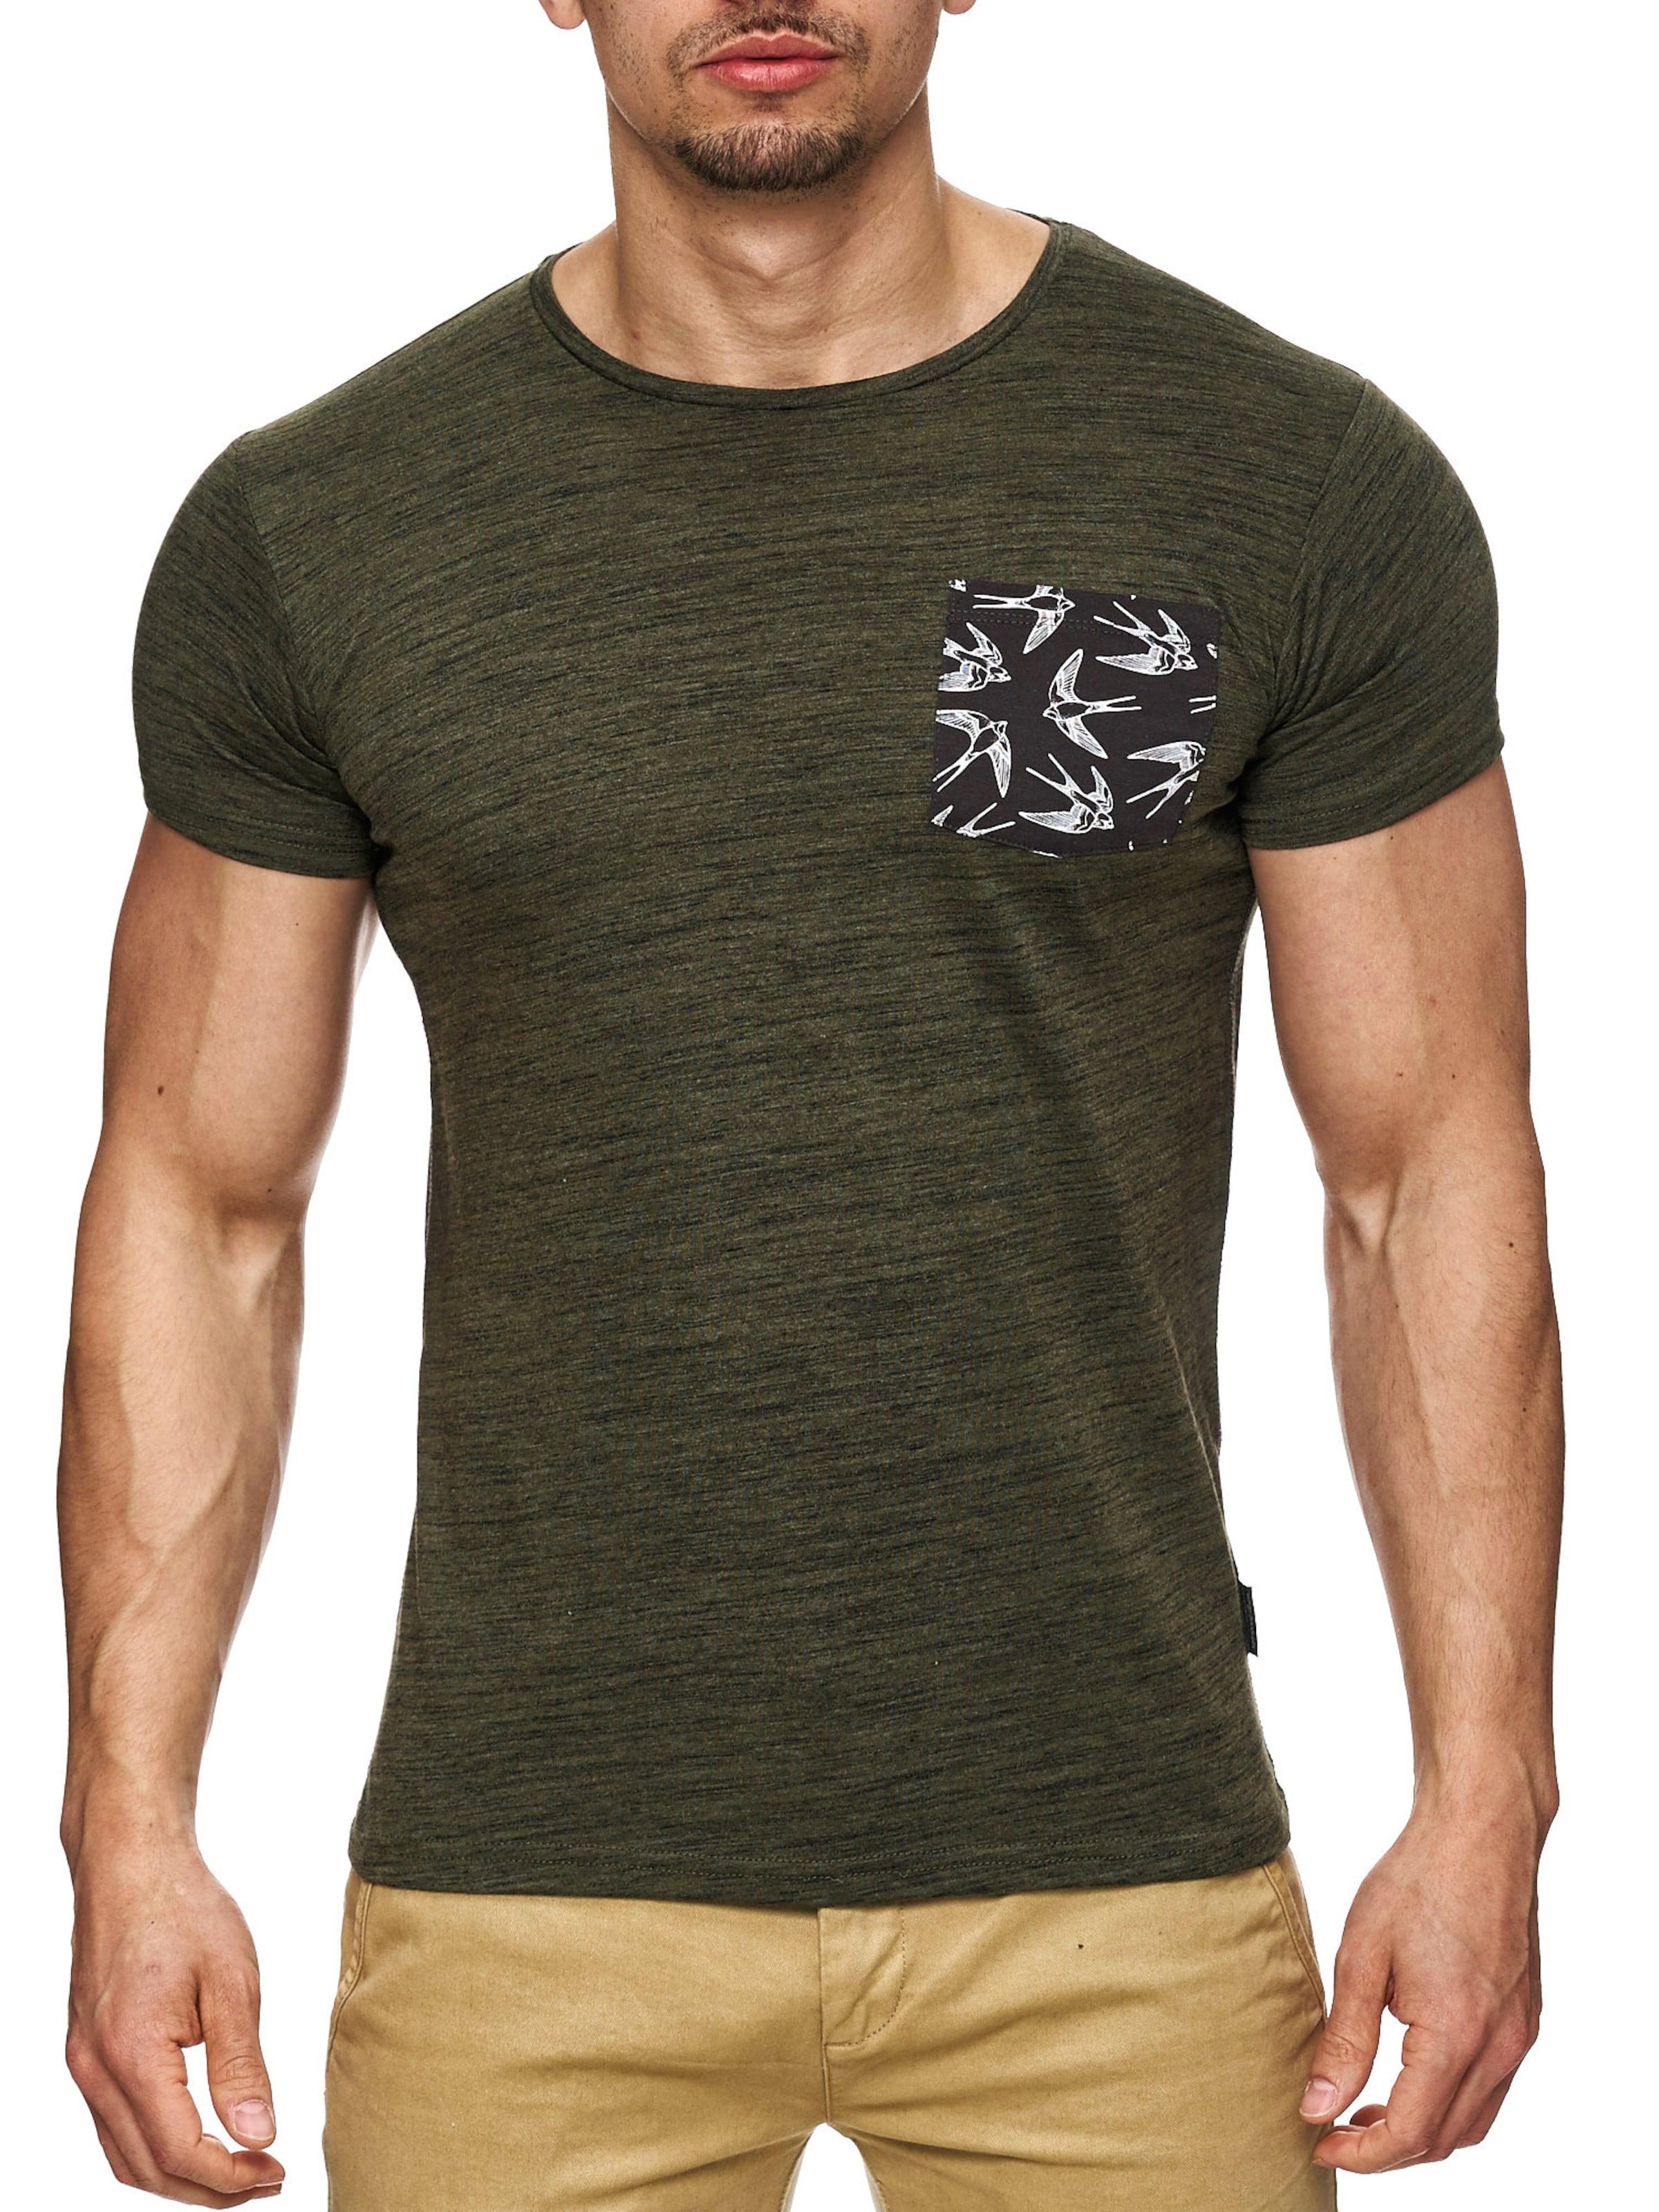 Jeans 'blaine' En shirt Indicode KakiNoir T Blanc fbg76y